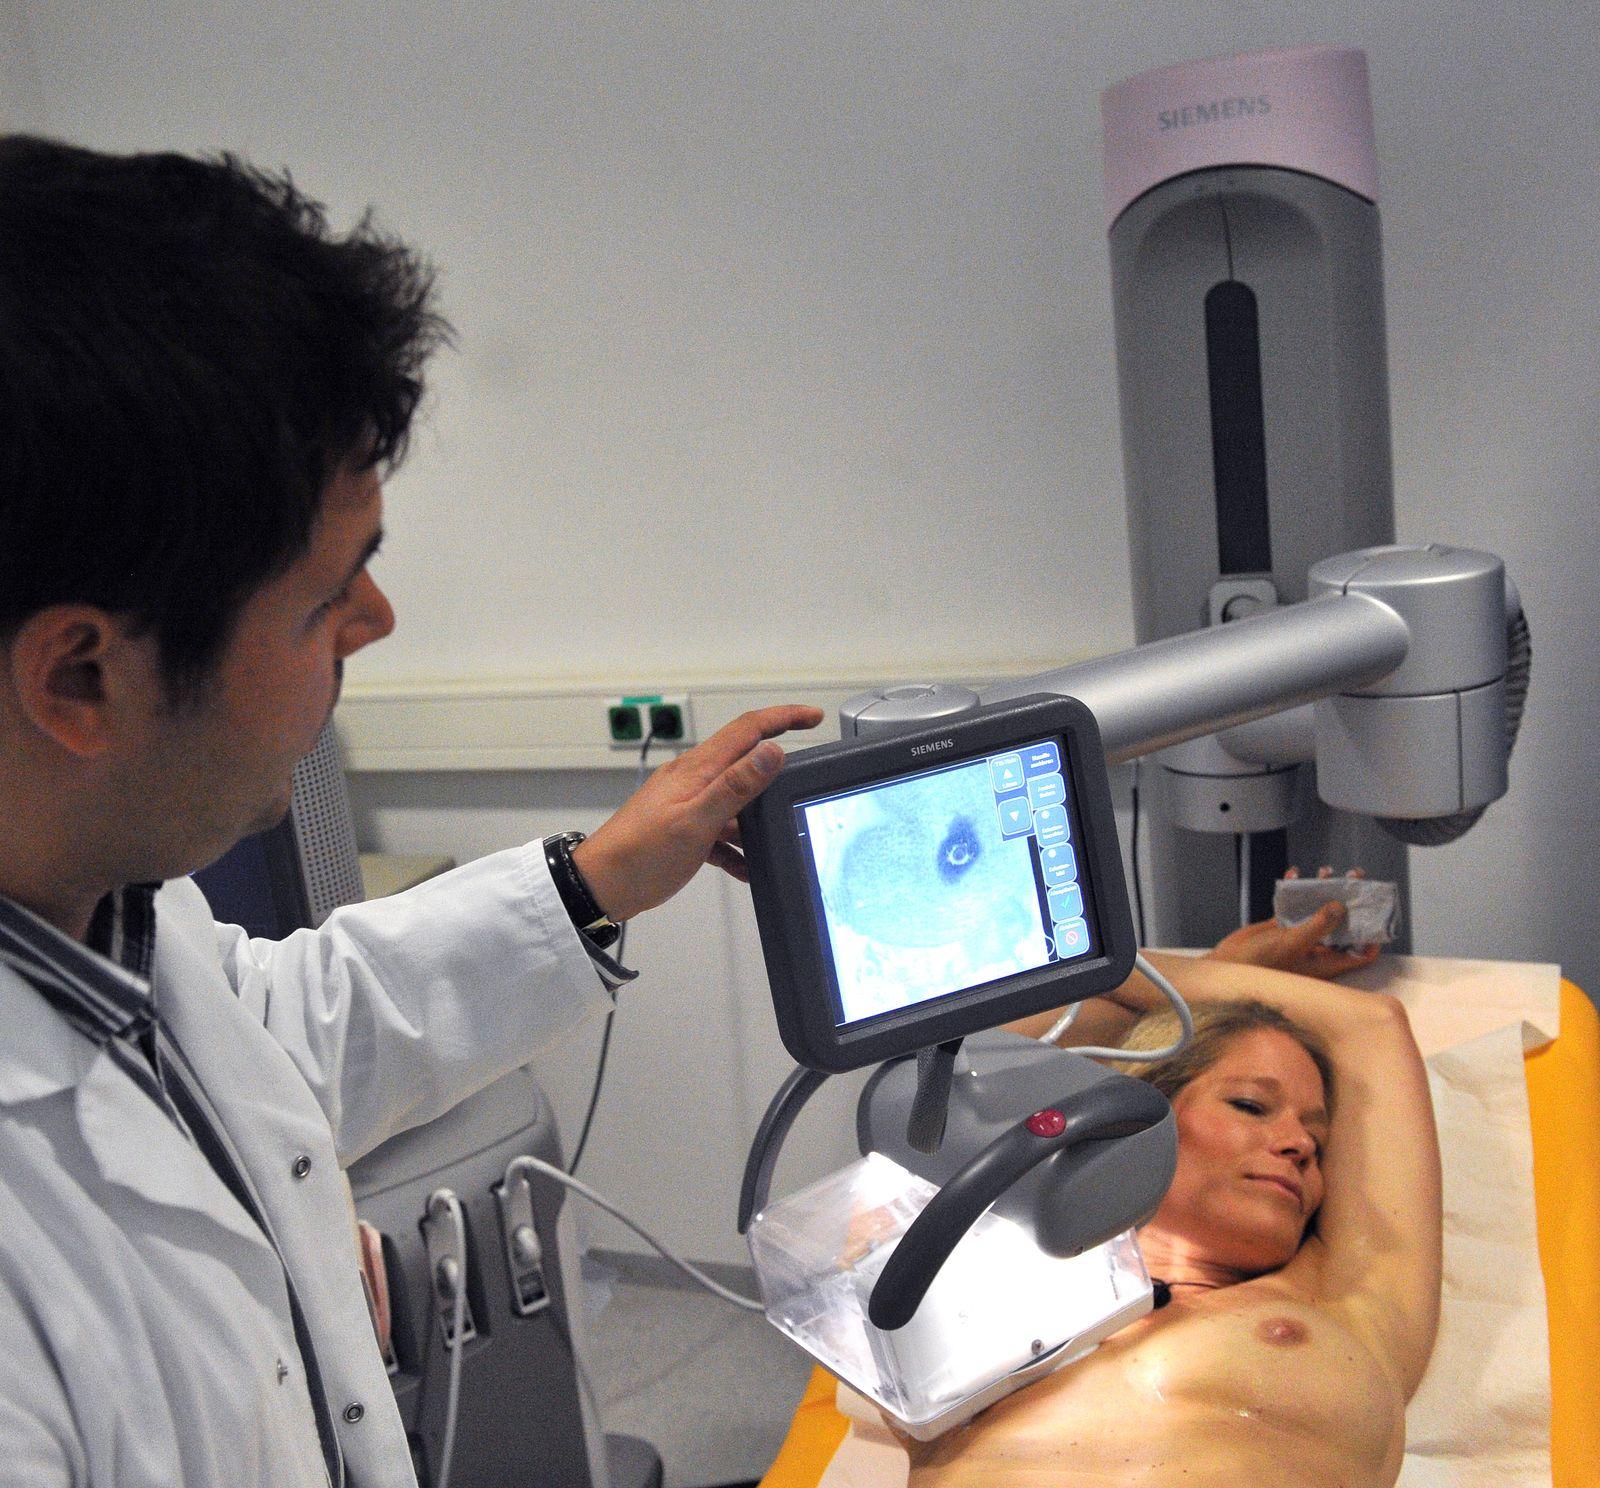 KaSP Ärztetypen / Gynäkologe / Ultraschall-Brustscanner zur Krebsdianose